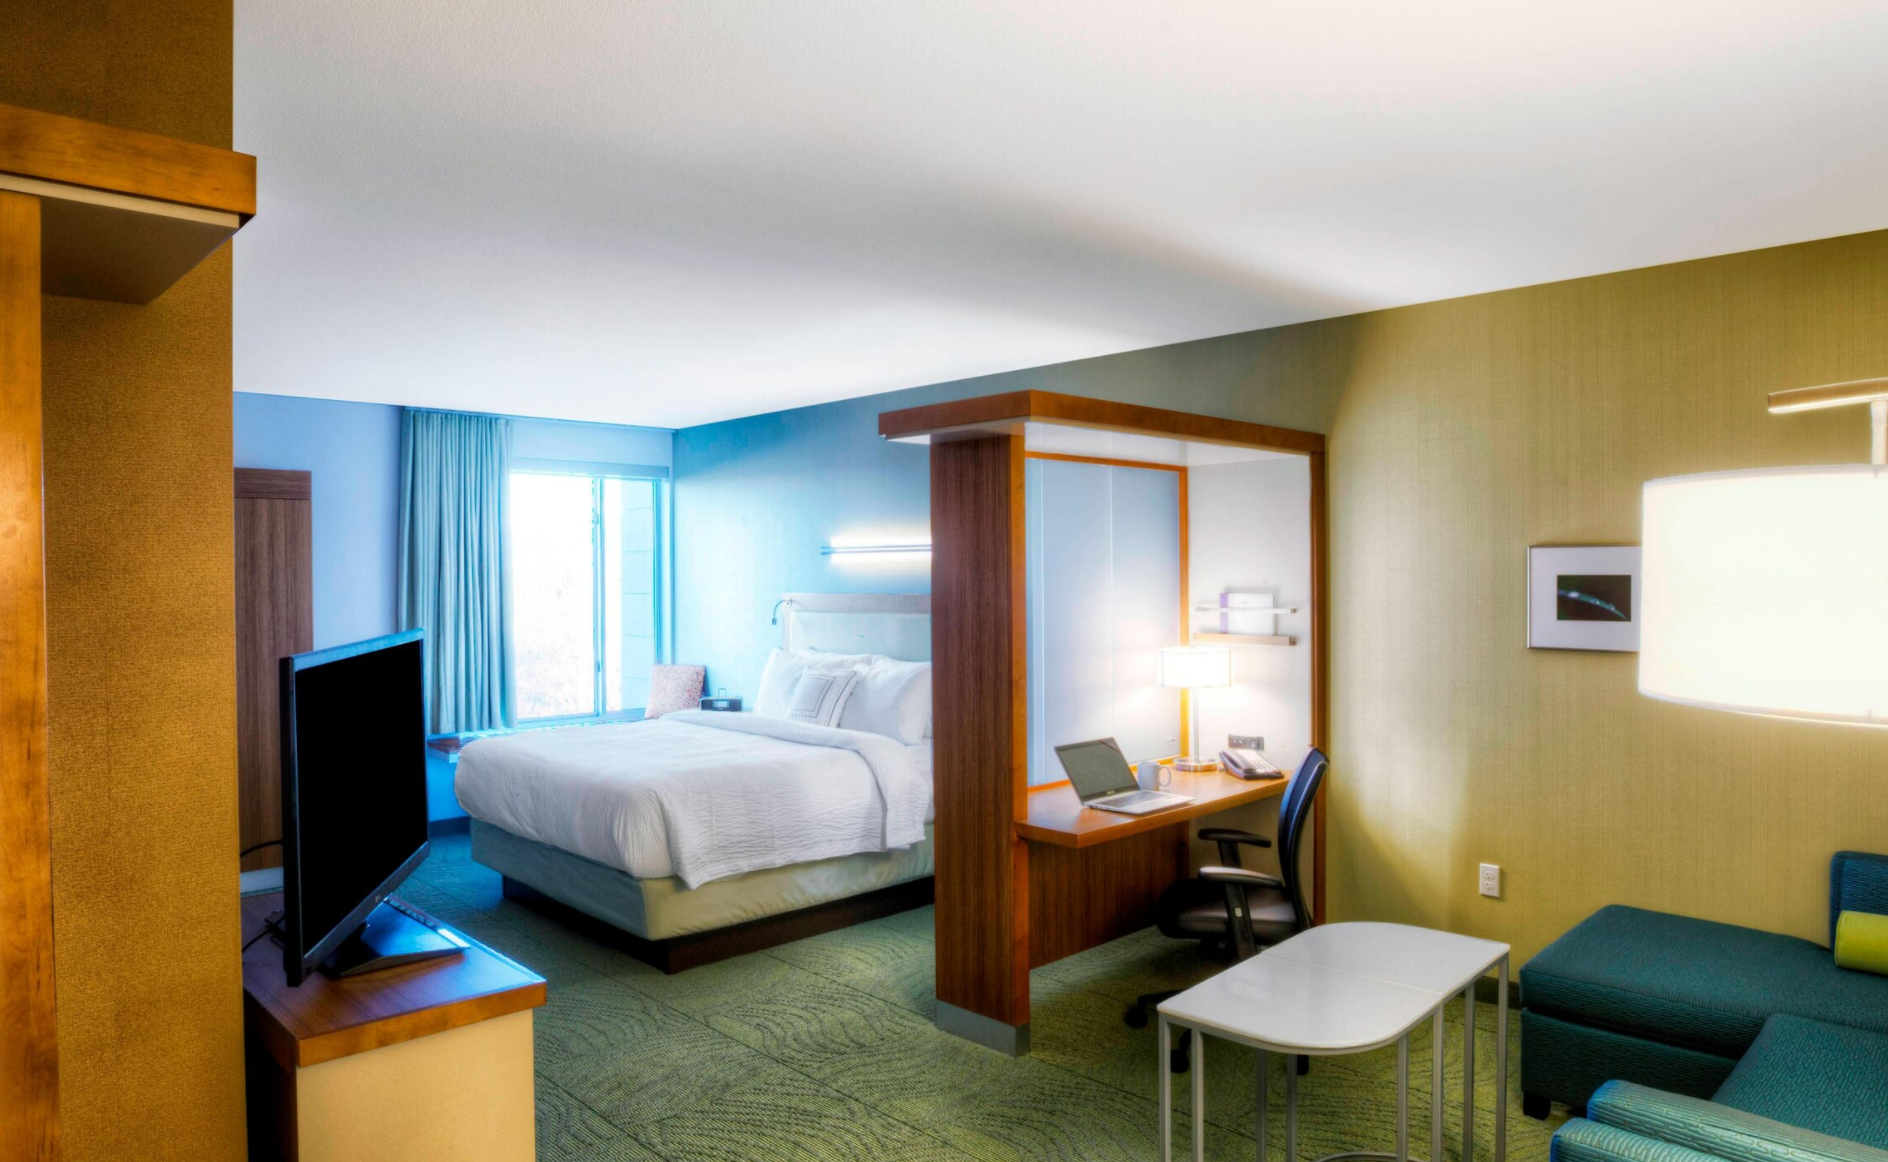 https://www.hotelsbyday.com/_data/default-hotel_image/4/22001/screenshot-2020-09-20-at-9-21-28-pm.png